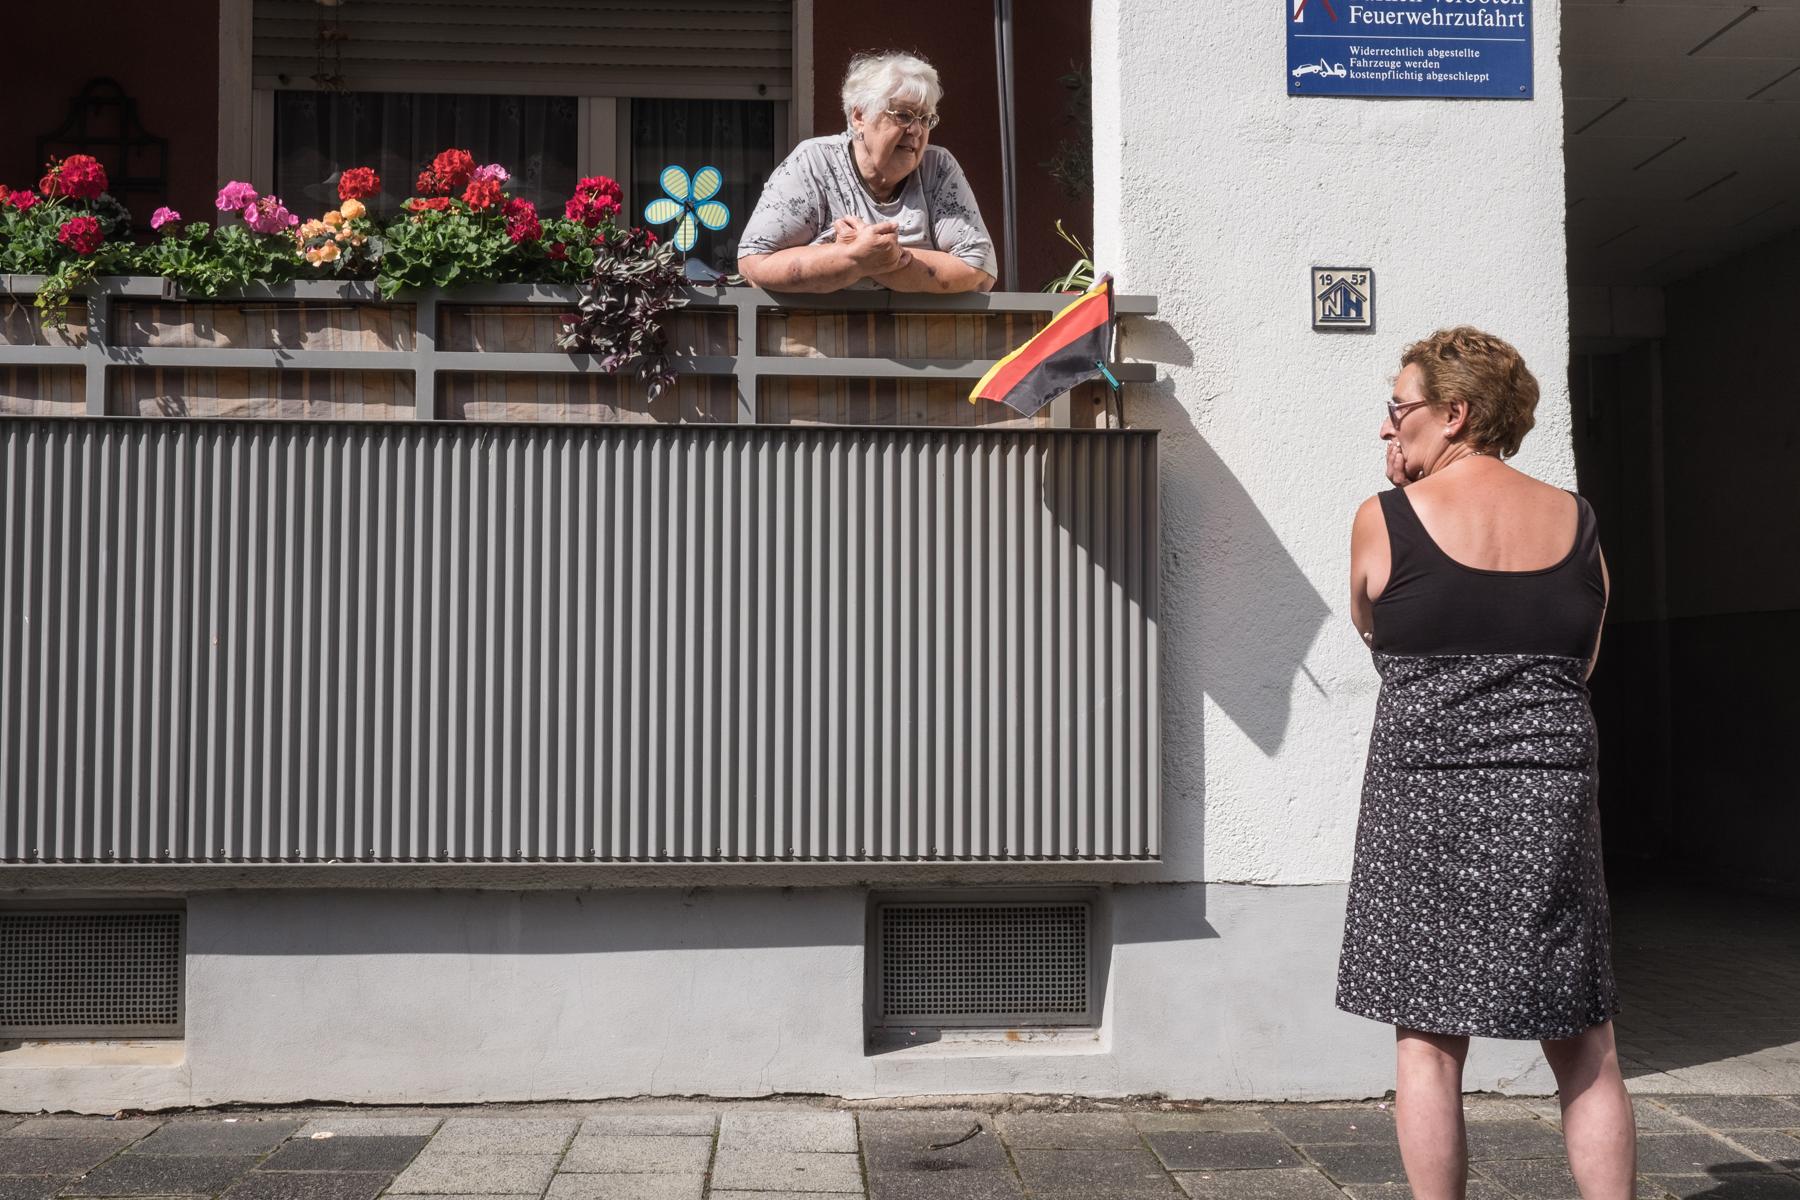 Street scene on Offenbach.